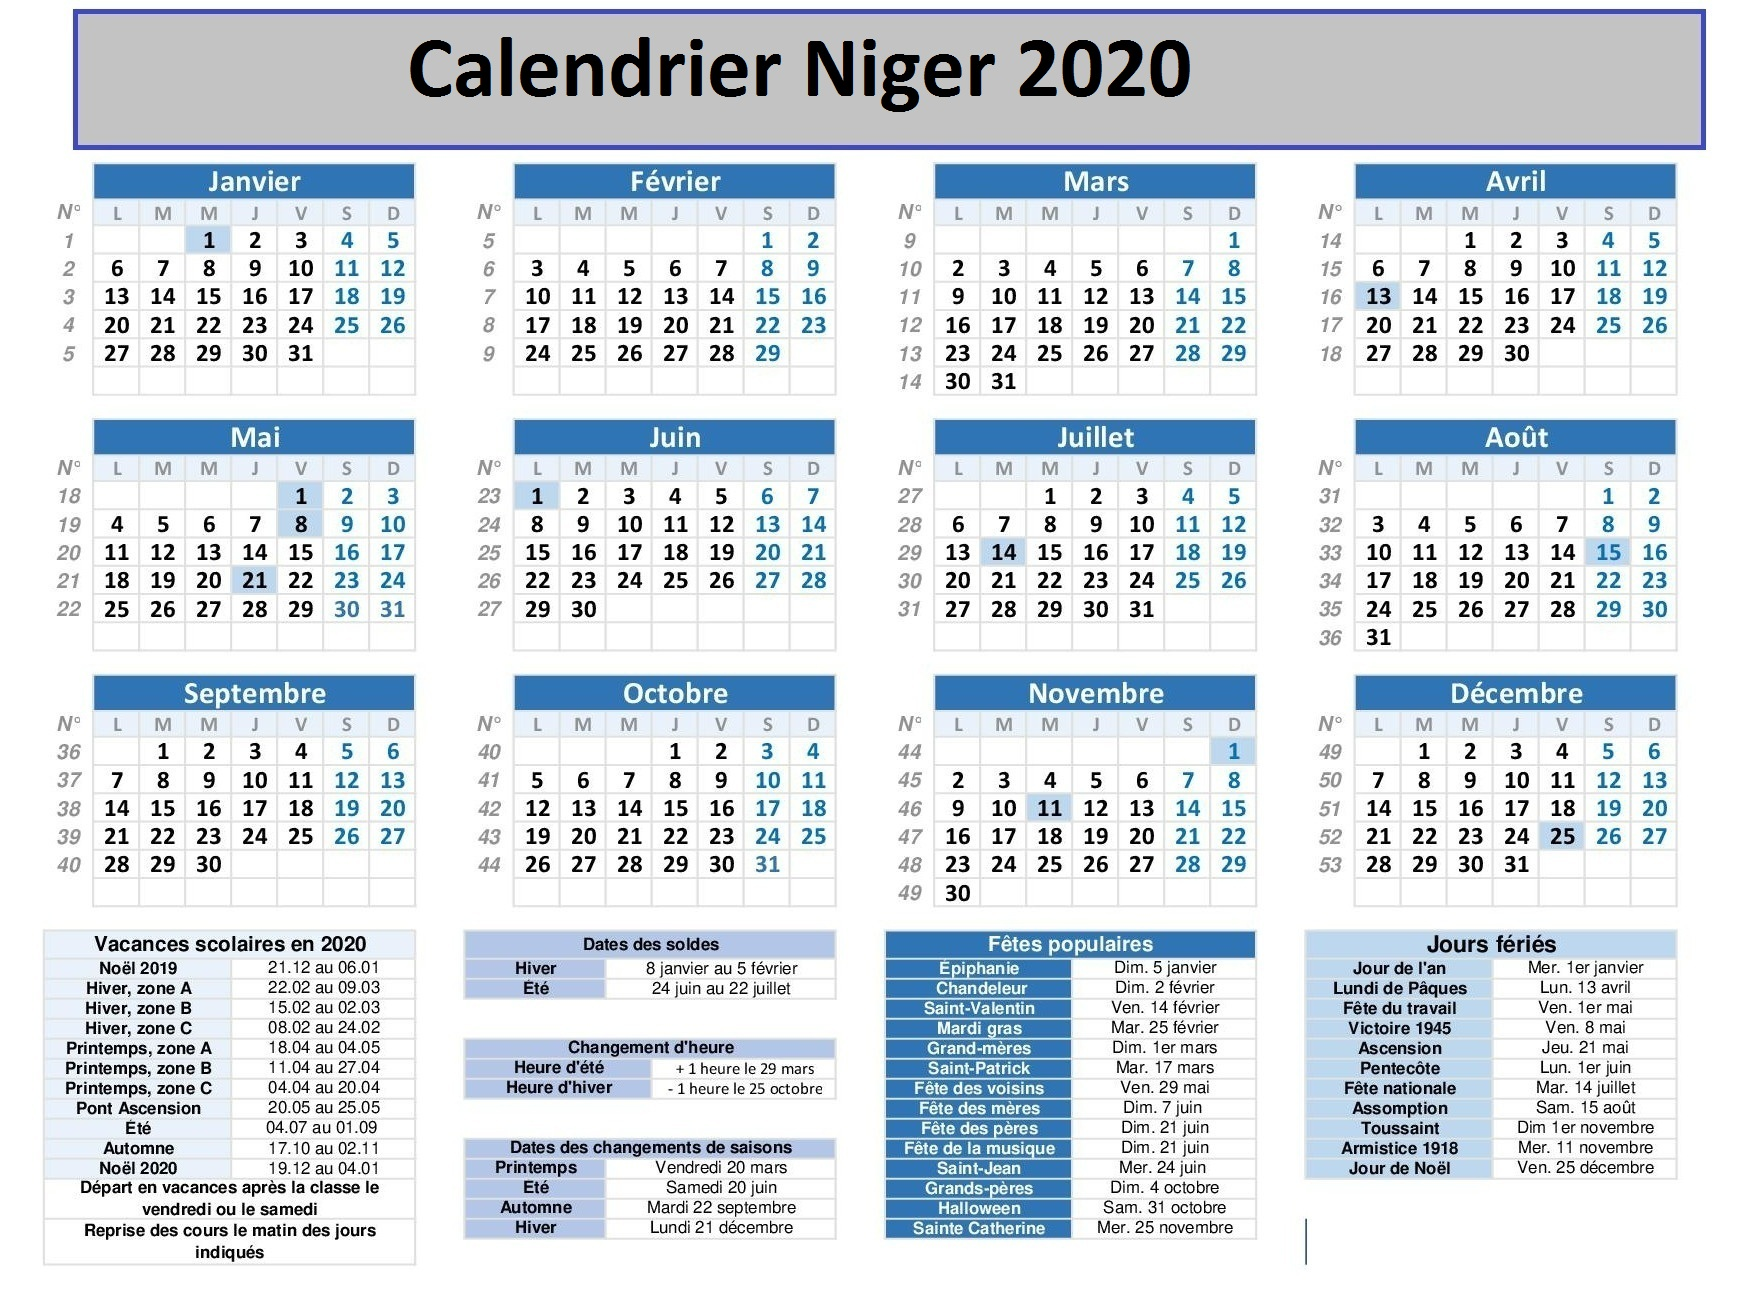 Calendrier Vaccinal Pev Niger 2020